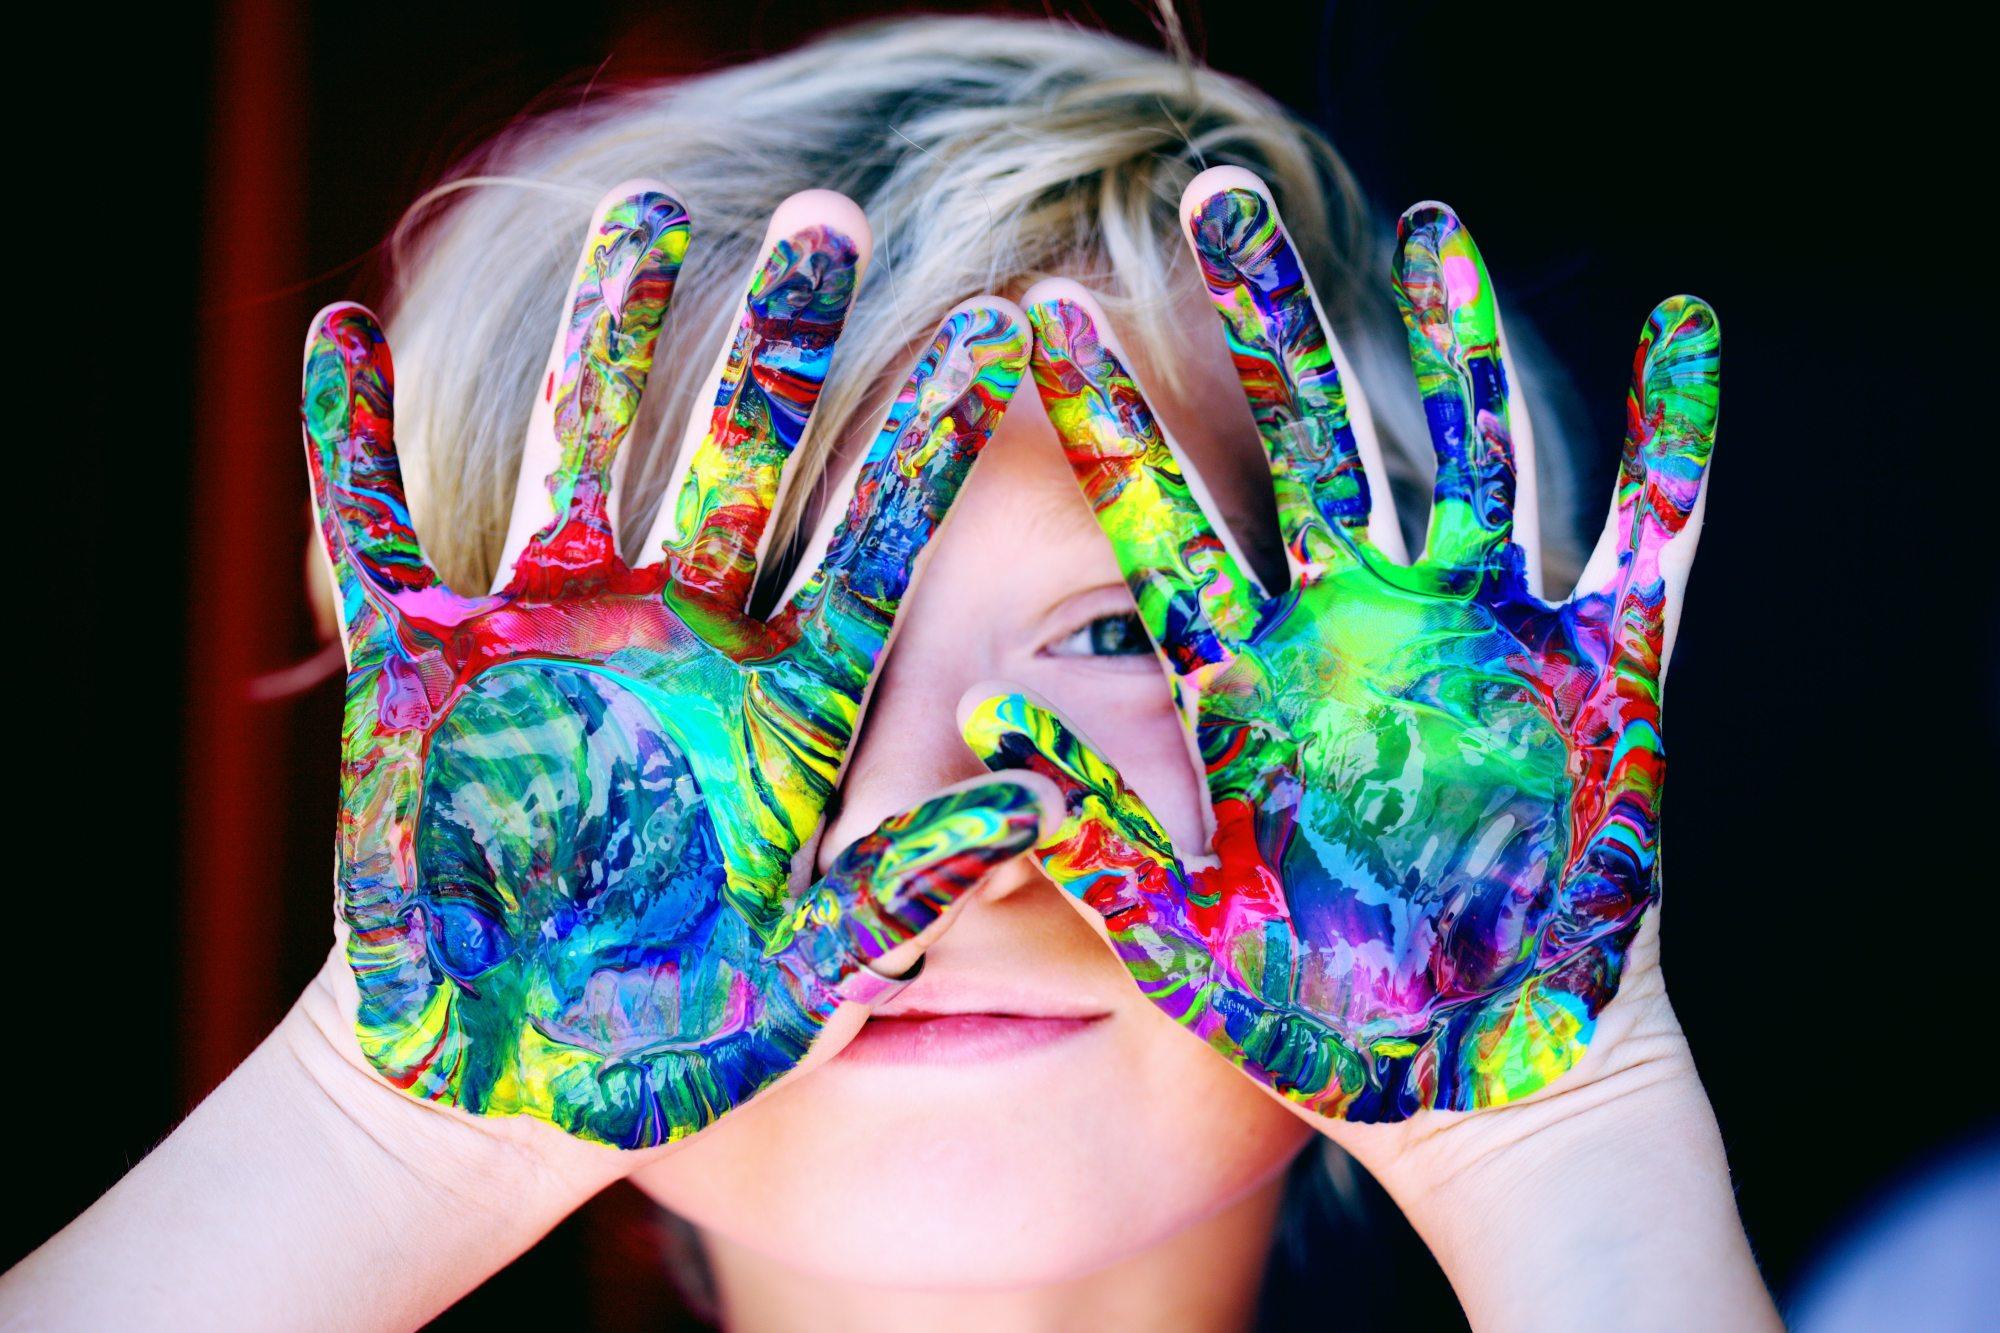 adhd, adhd awareness, adhd in children, therapy in orem utah, aspen valley counseling, neurofeedback